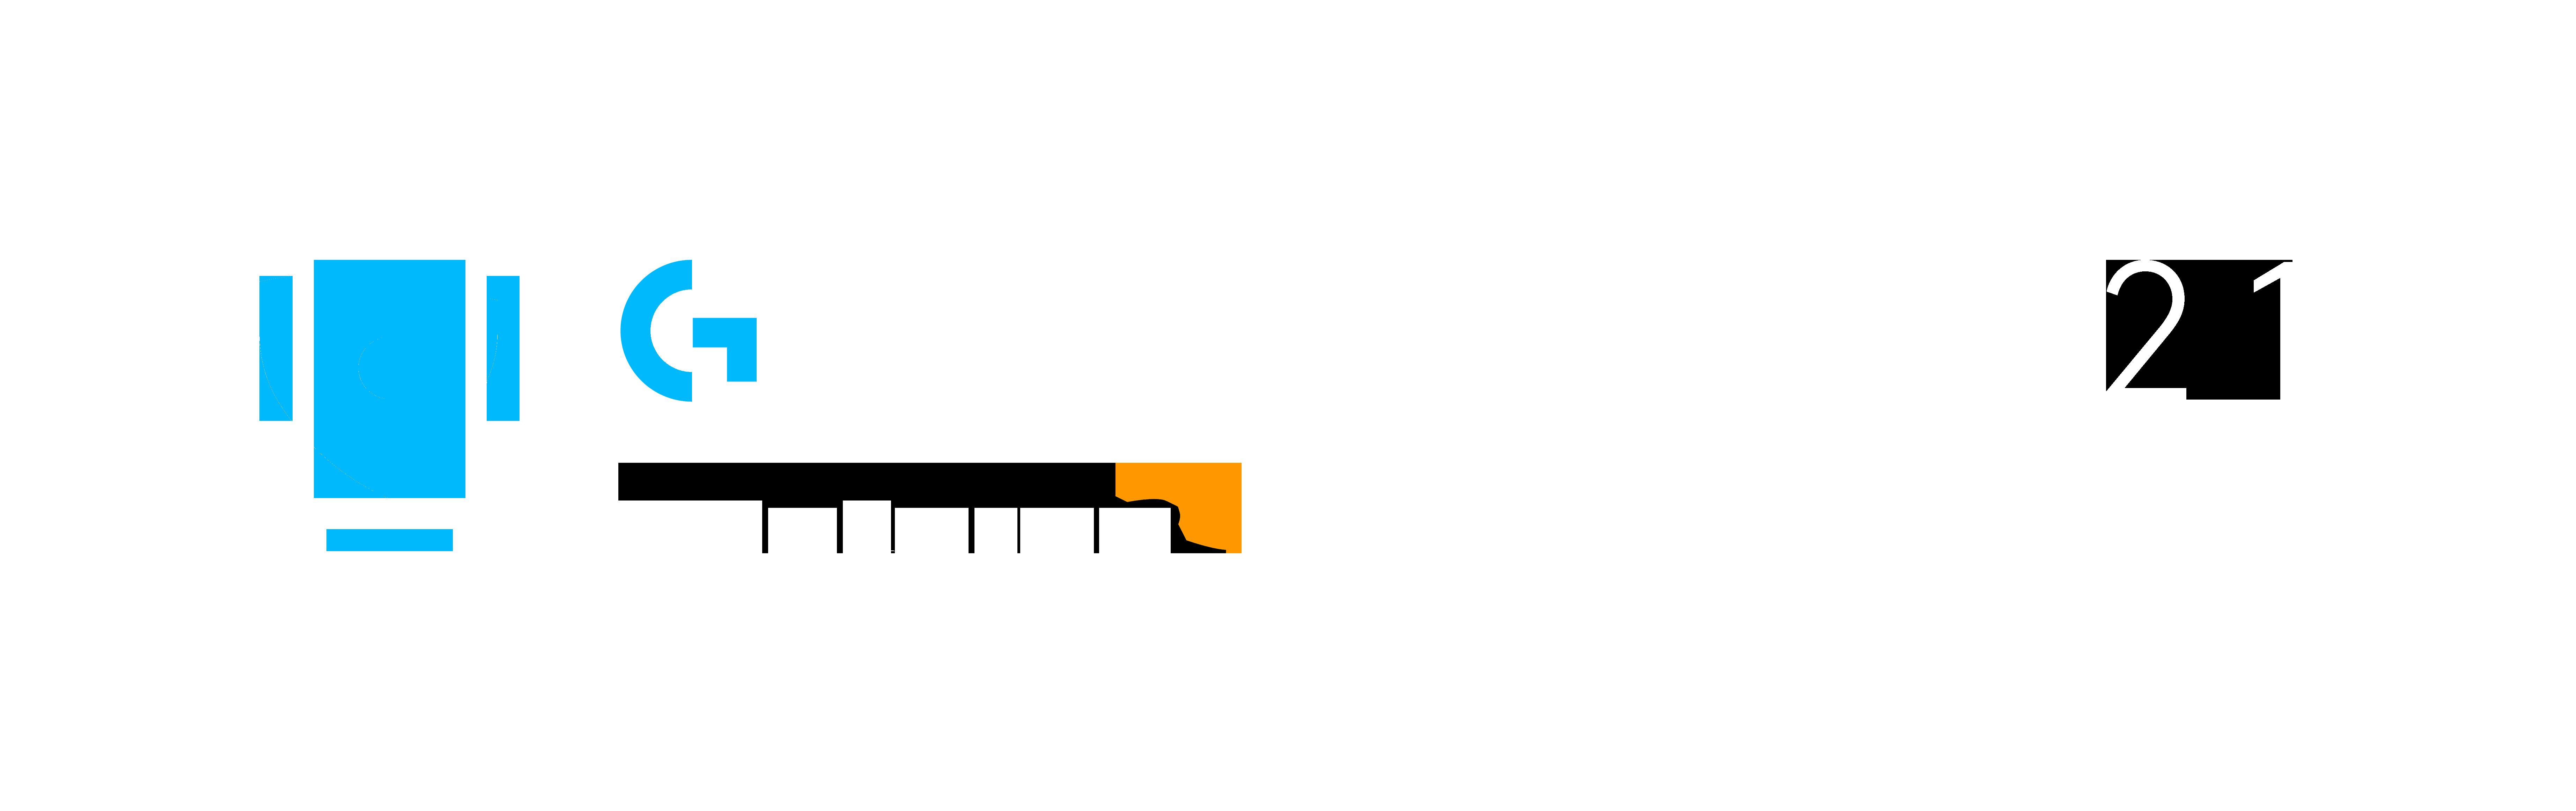 Logitech G McLaren Challenge 2021